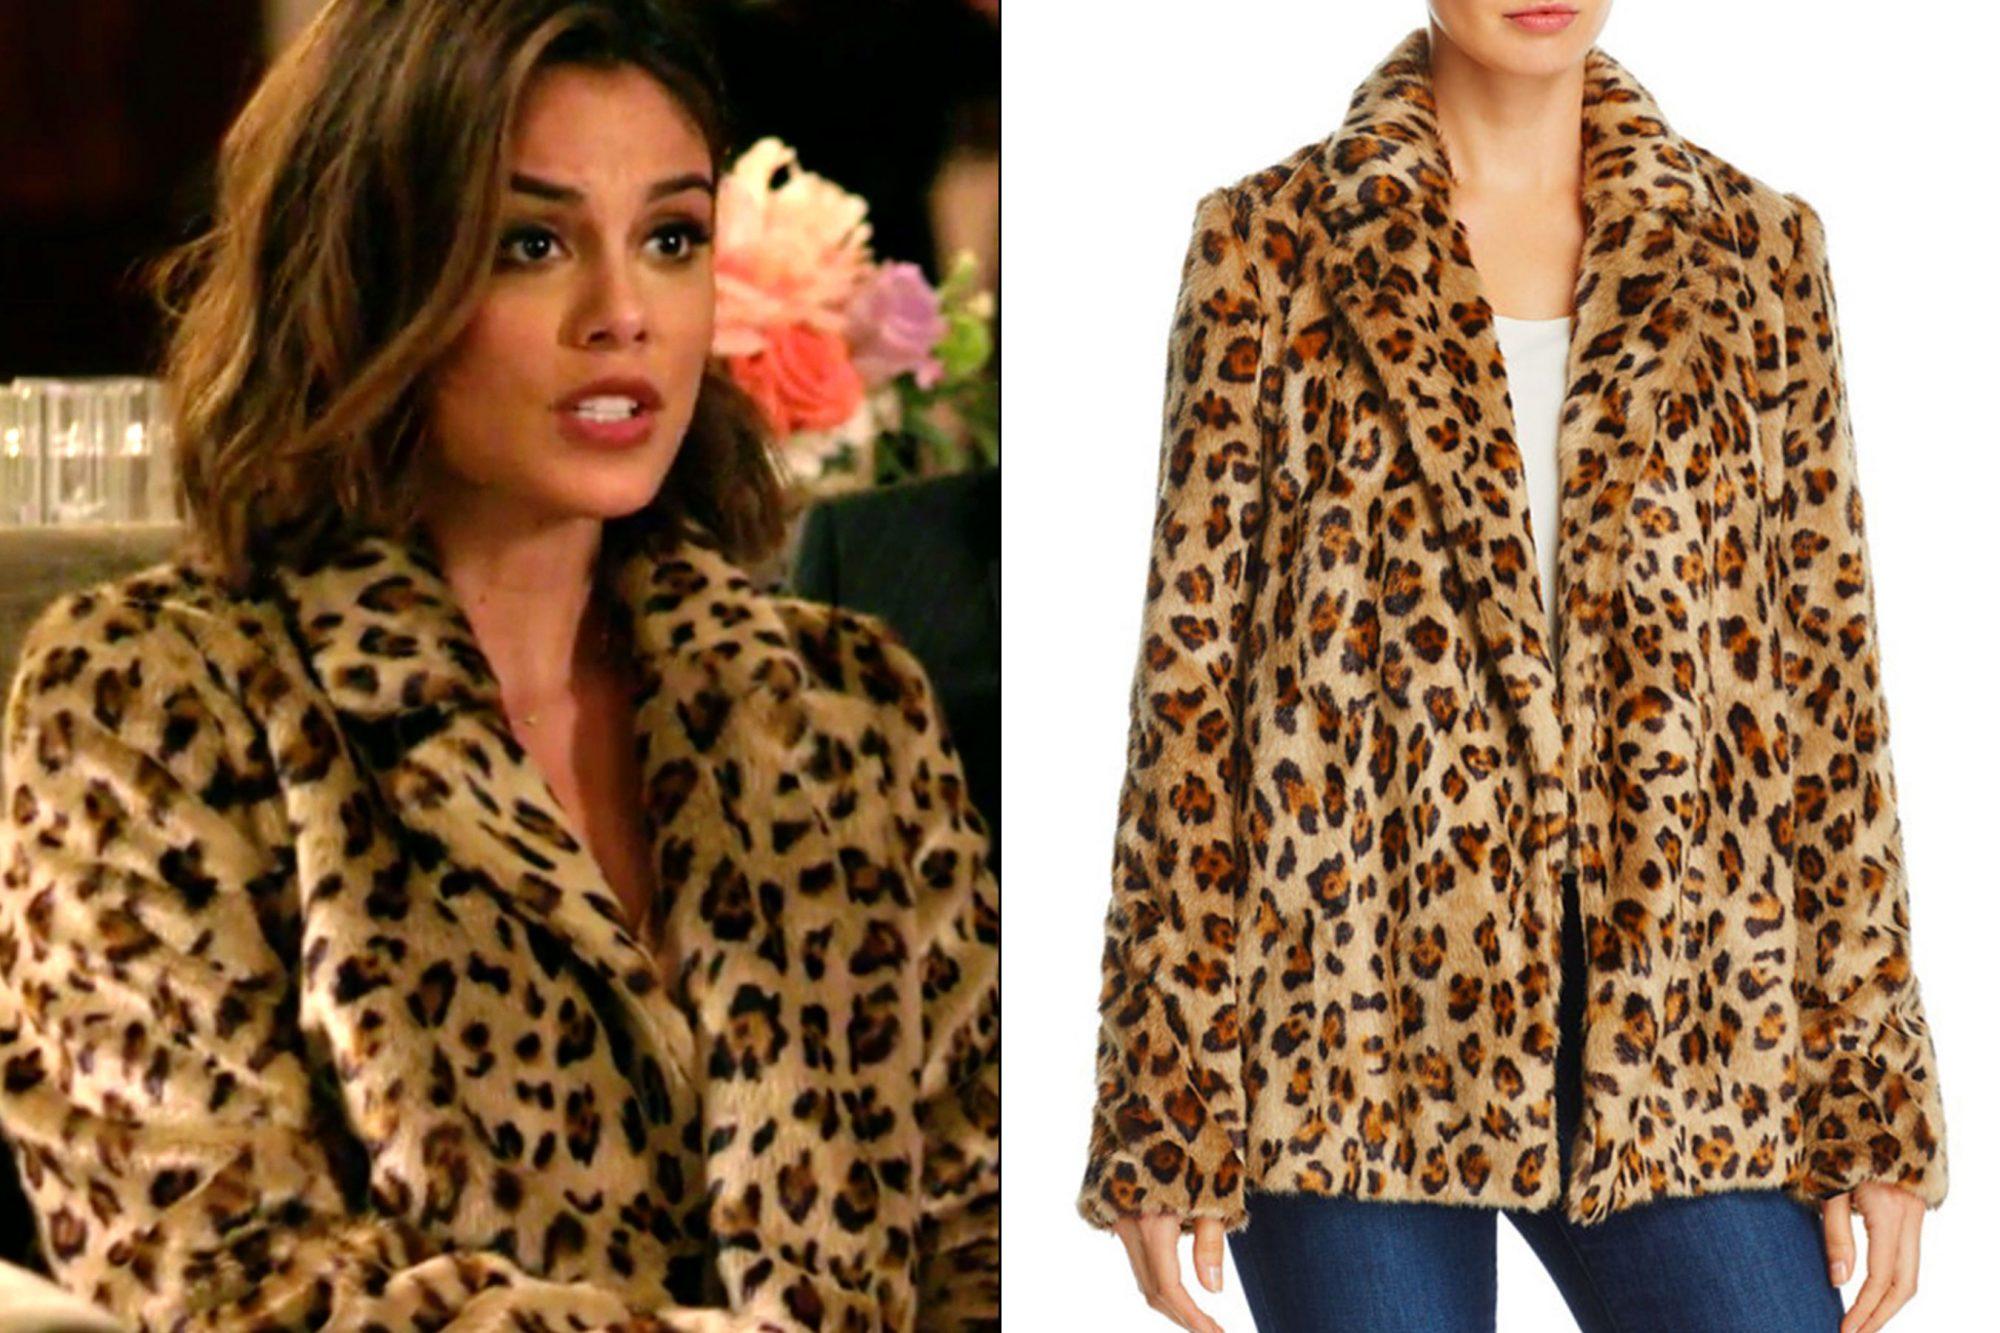 Cristal Flores' (Nathalie Kelley) leopard print coat on Dynasty